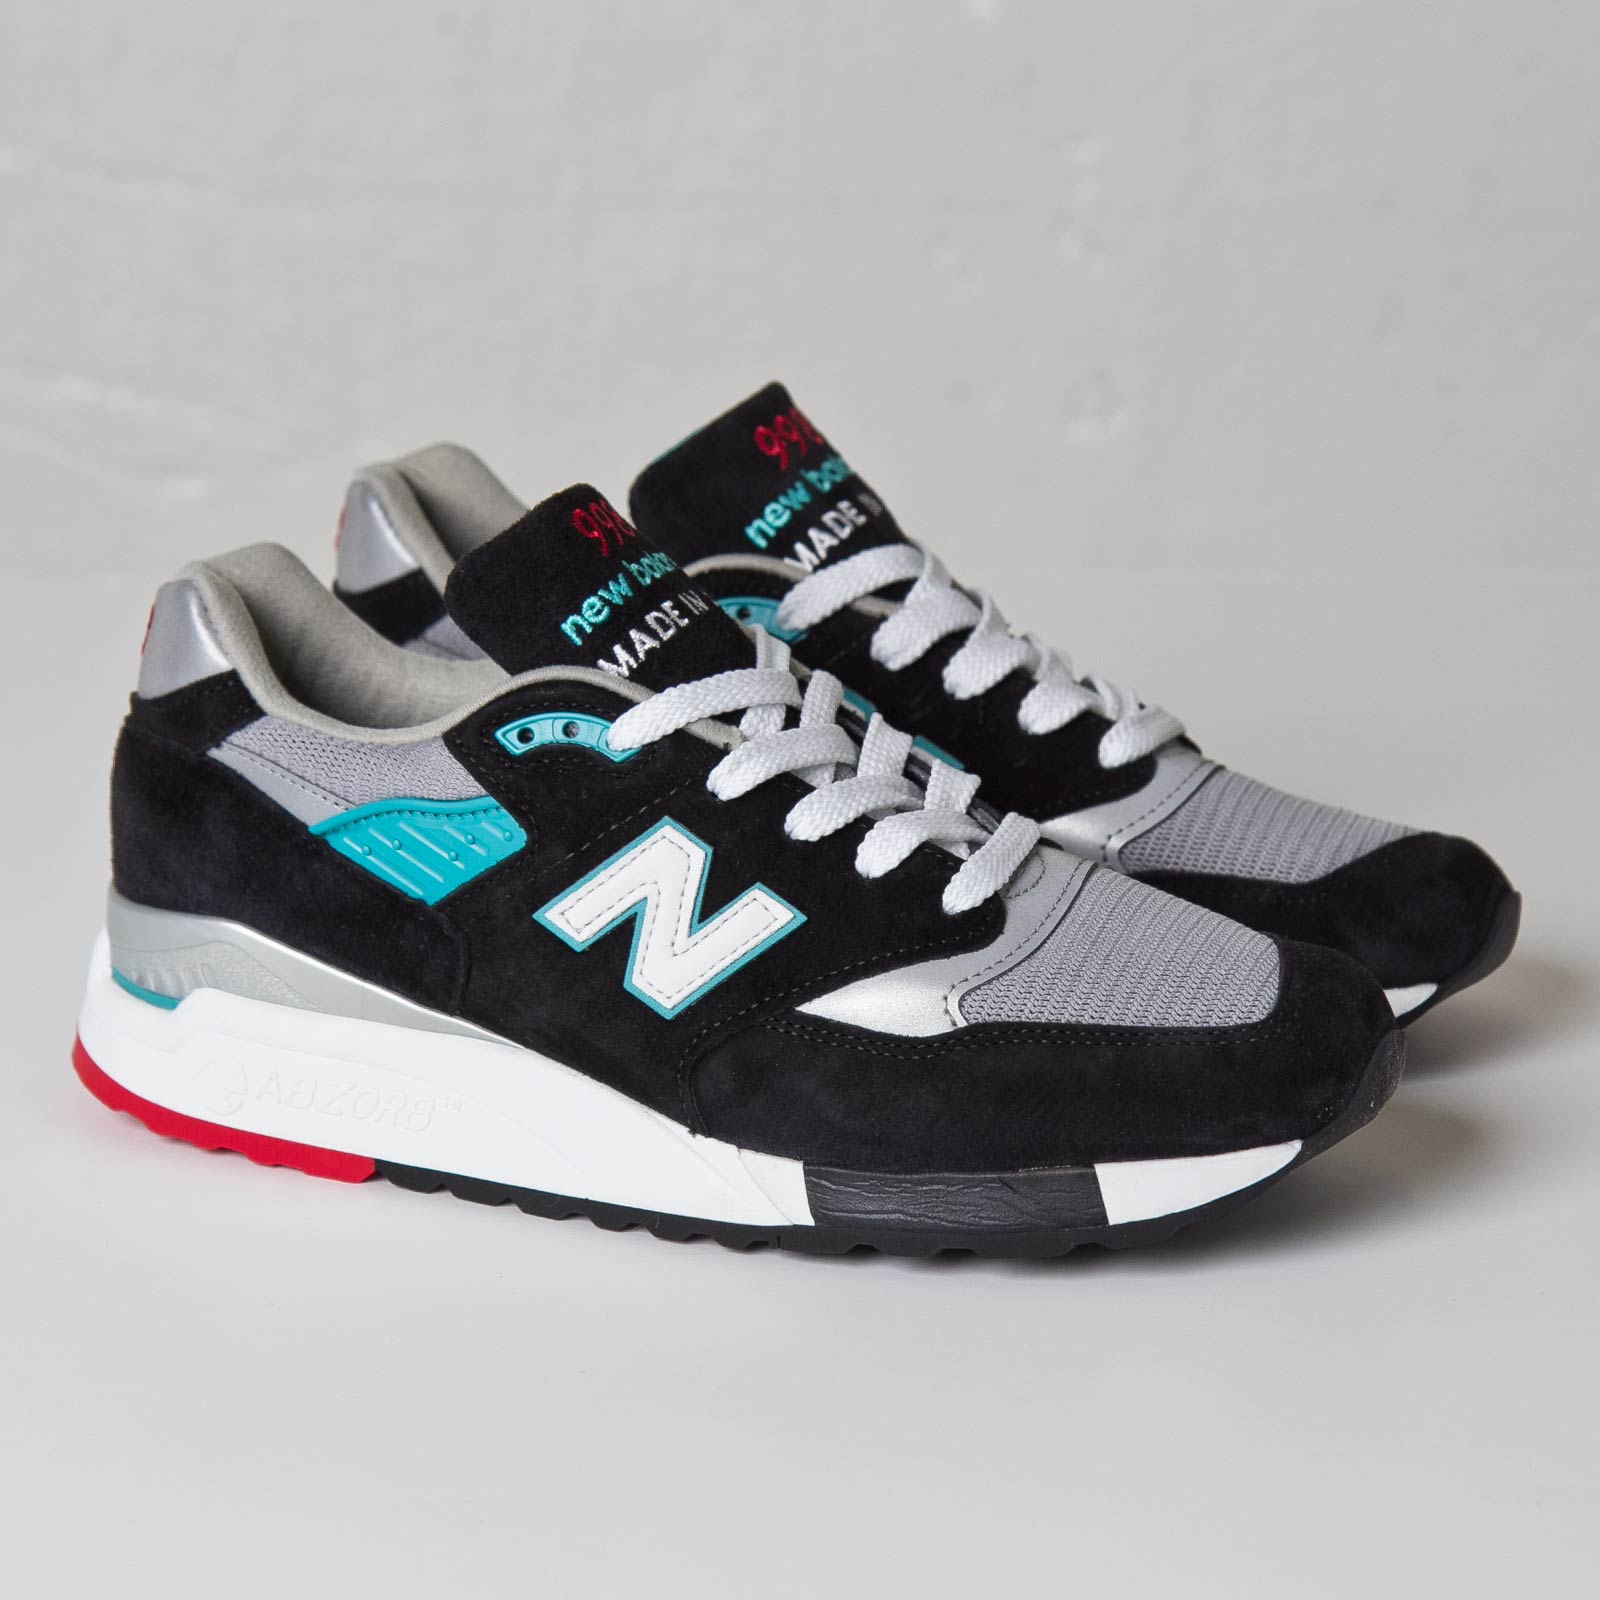 hot sale online 41e18 c052f New Balance M998 - M998cbb - Sneakersnstuff | sneakers ...